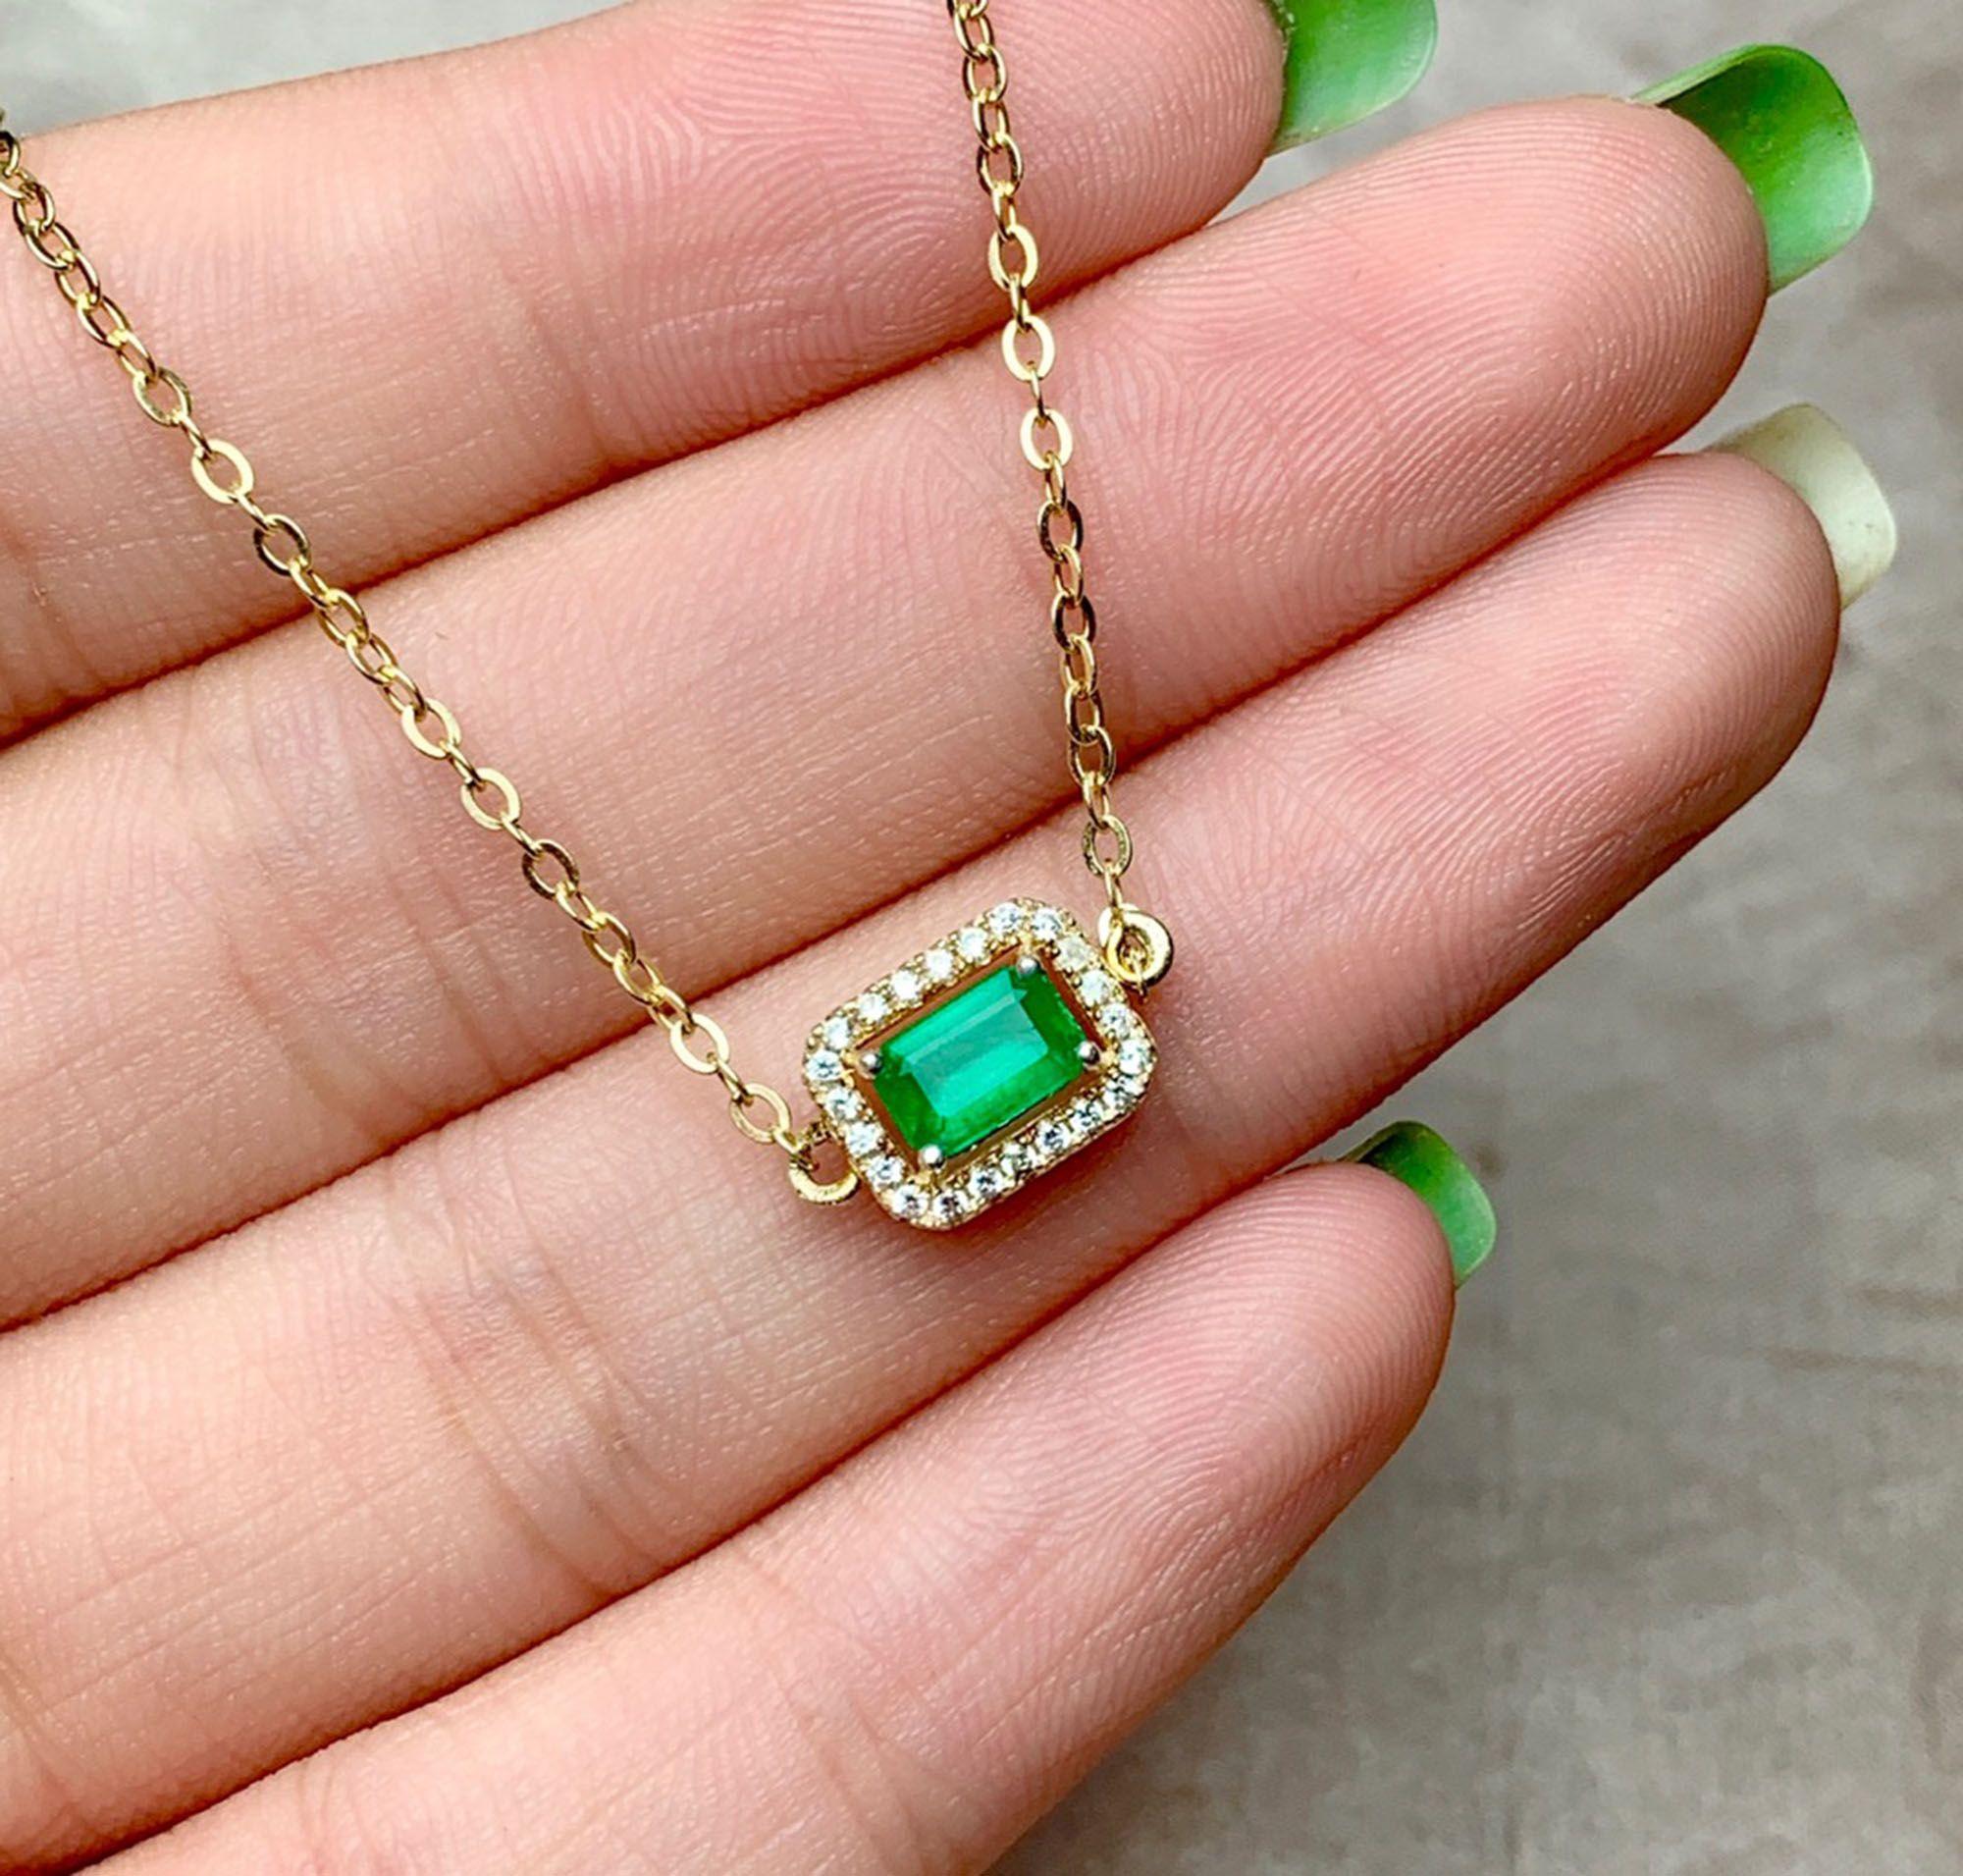 Rectangle Aaa Natural Emerald Necklace Pendant Statement Etsy Emerald Necklace Emerald Necklace Pendant Emerald Bracelet